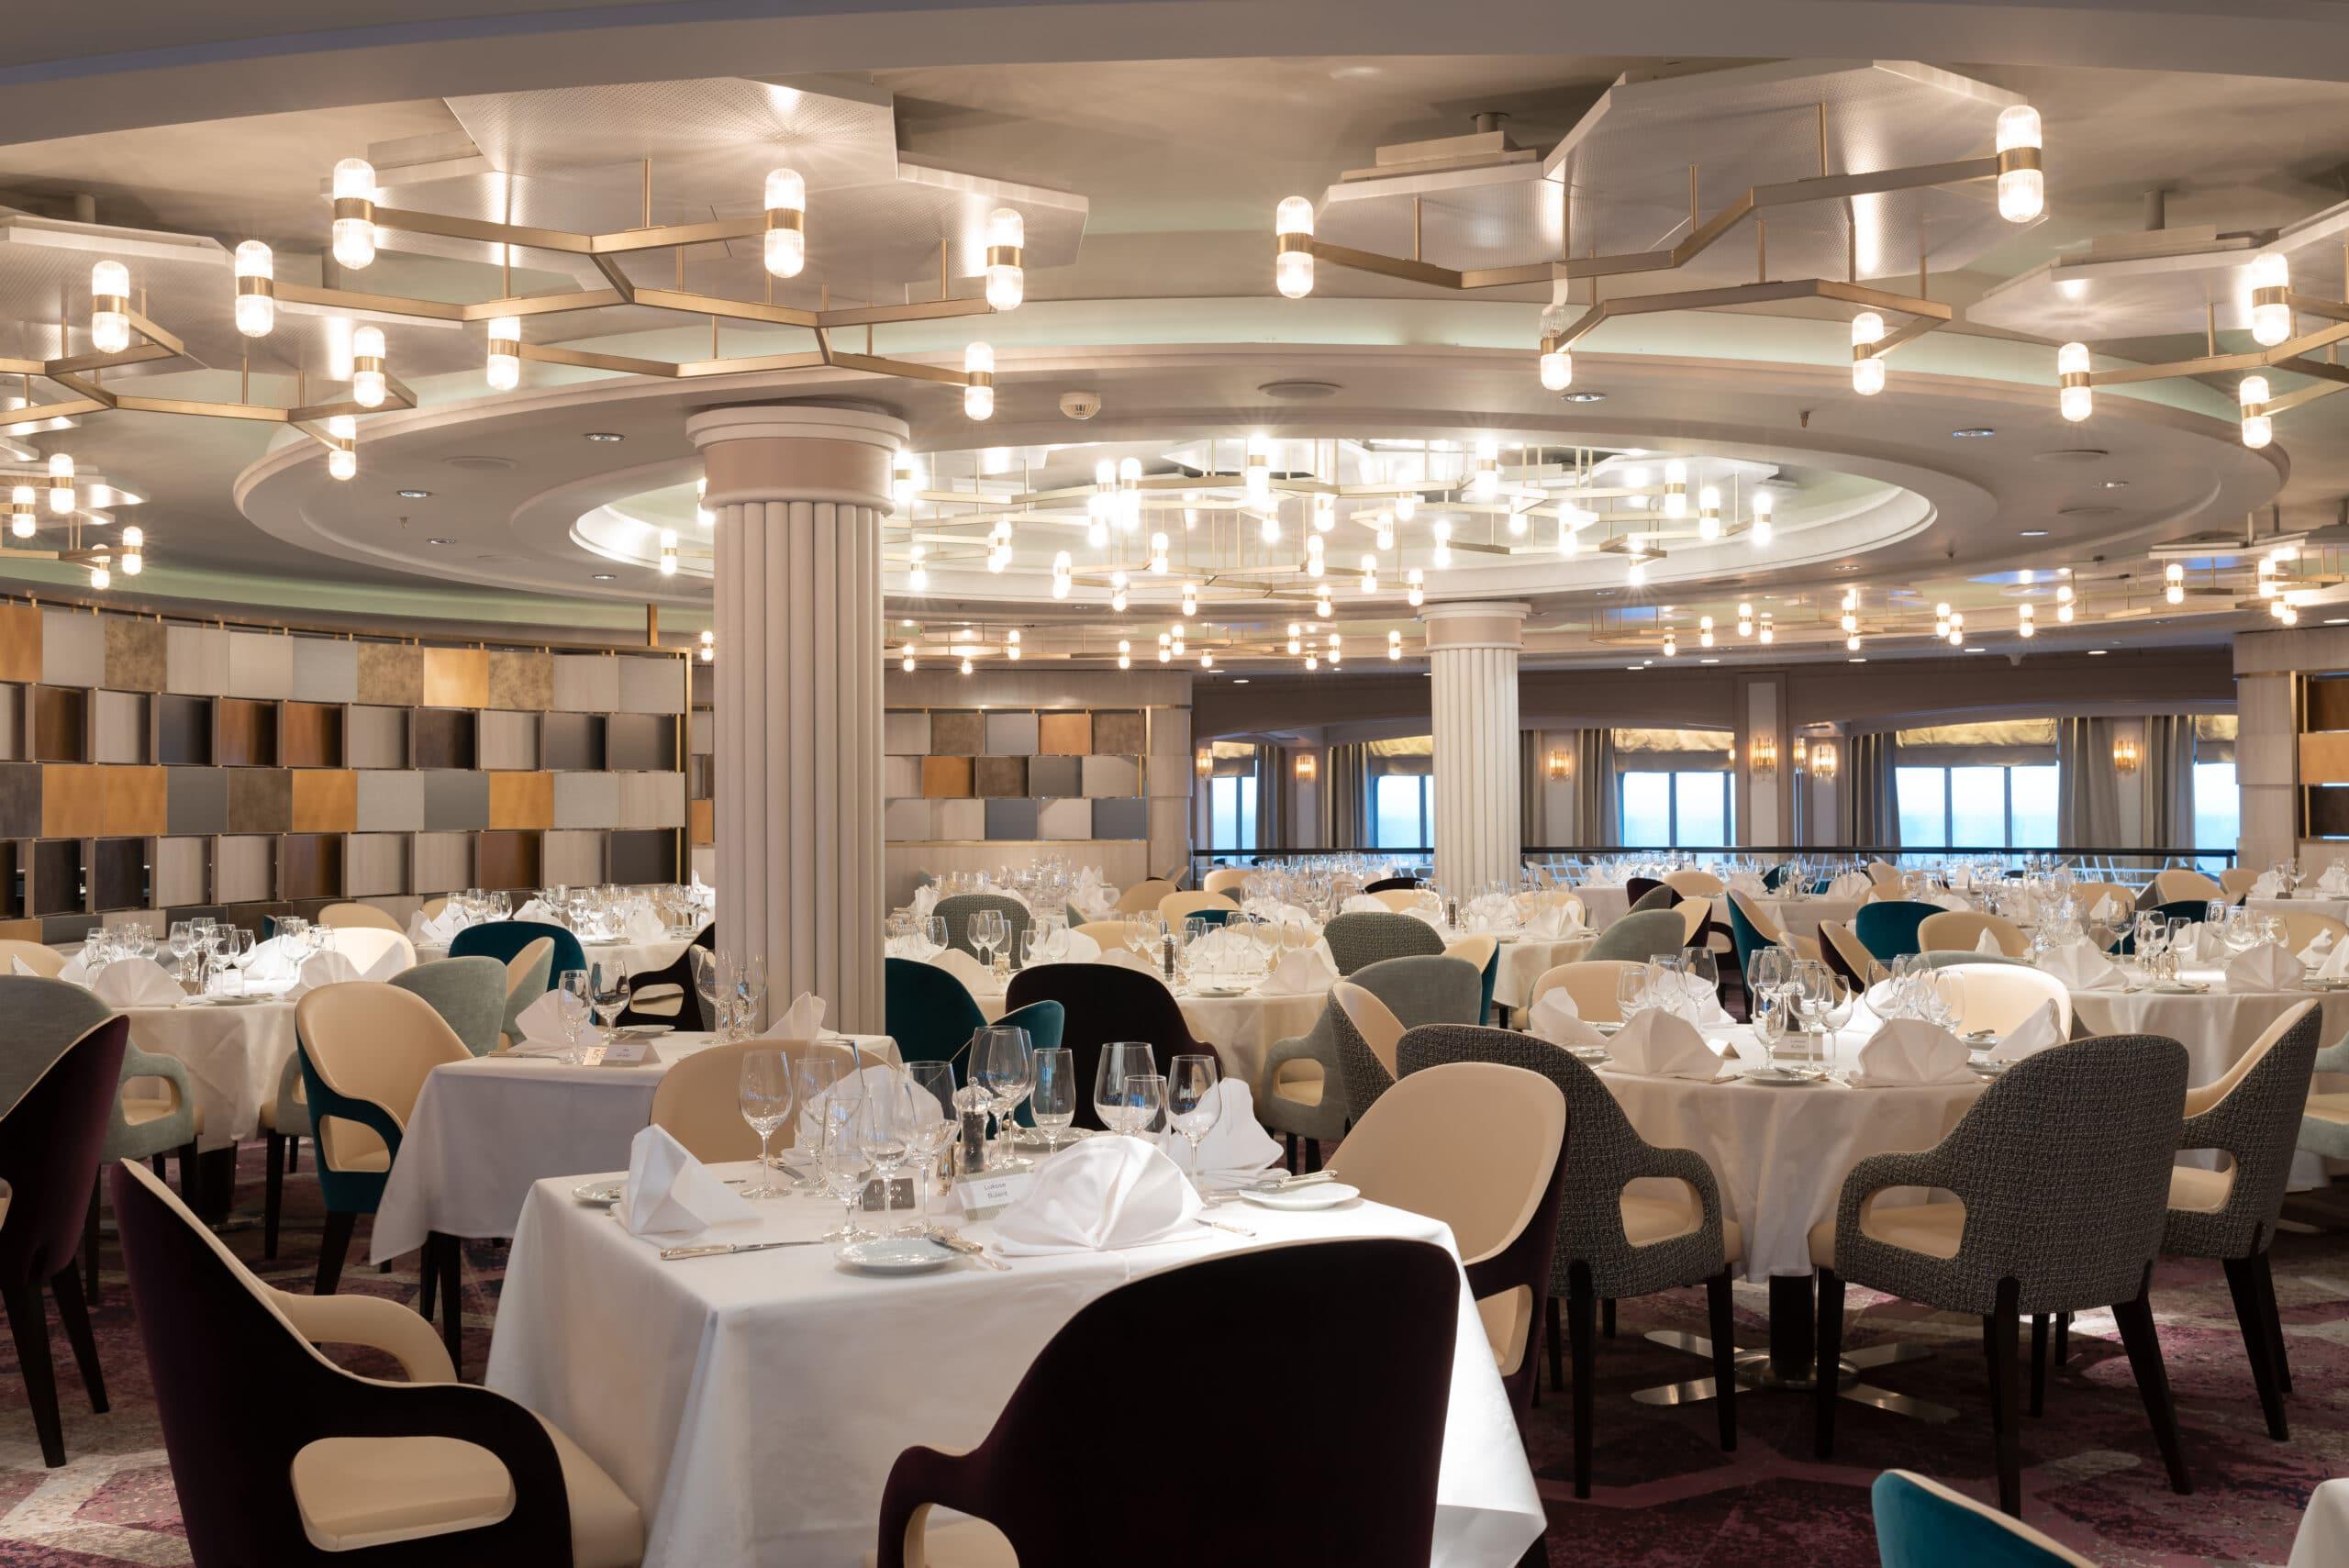 Cruiseschip-Crystal Serenity-Crystal Cruises-Restaurant Waterside